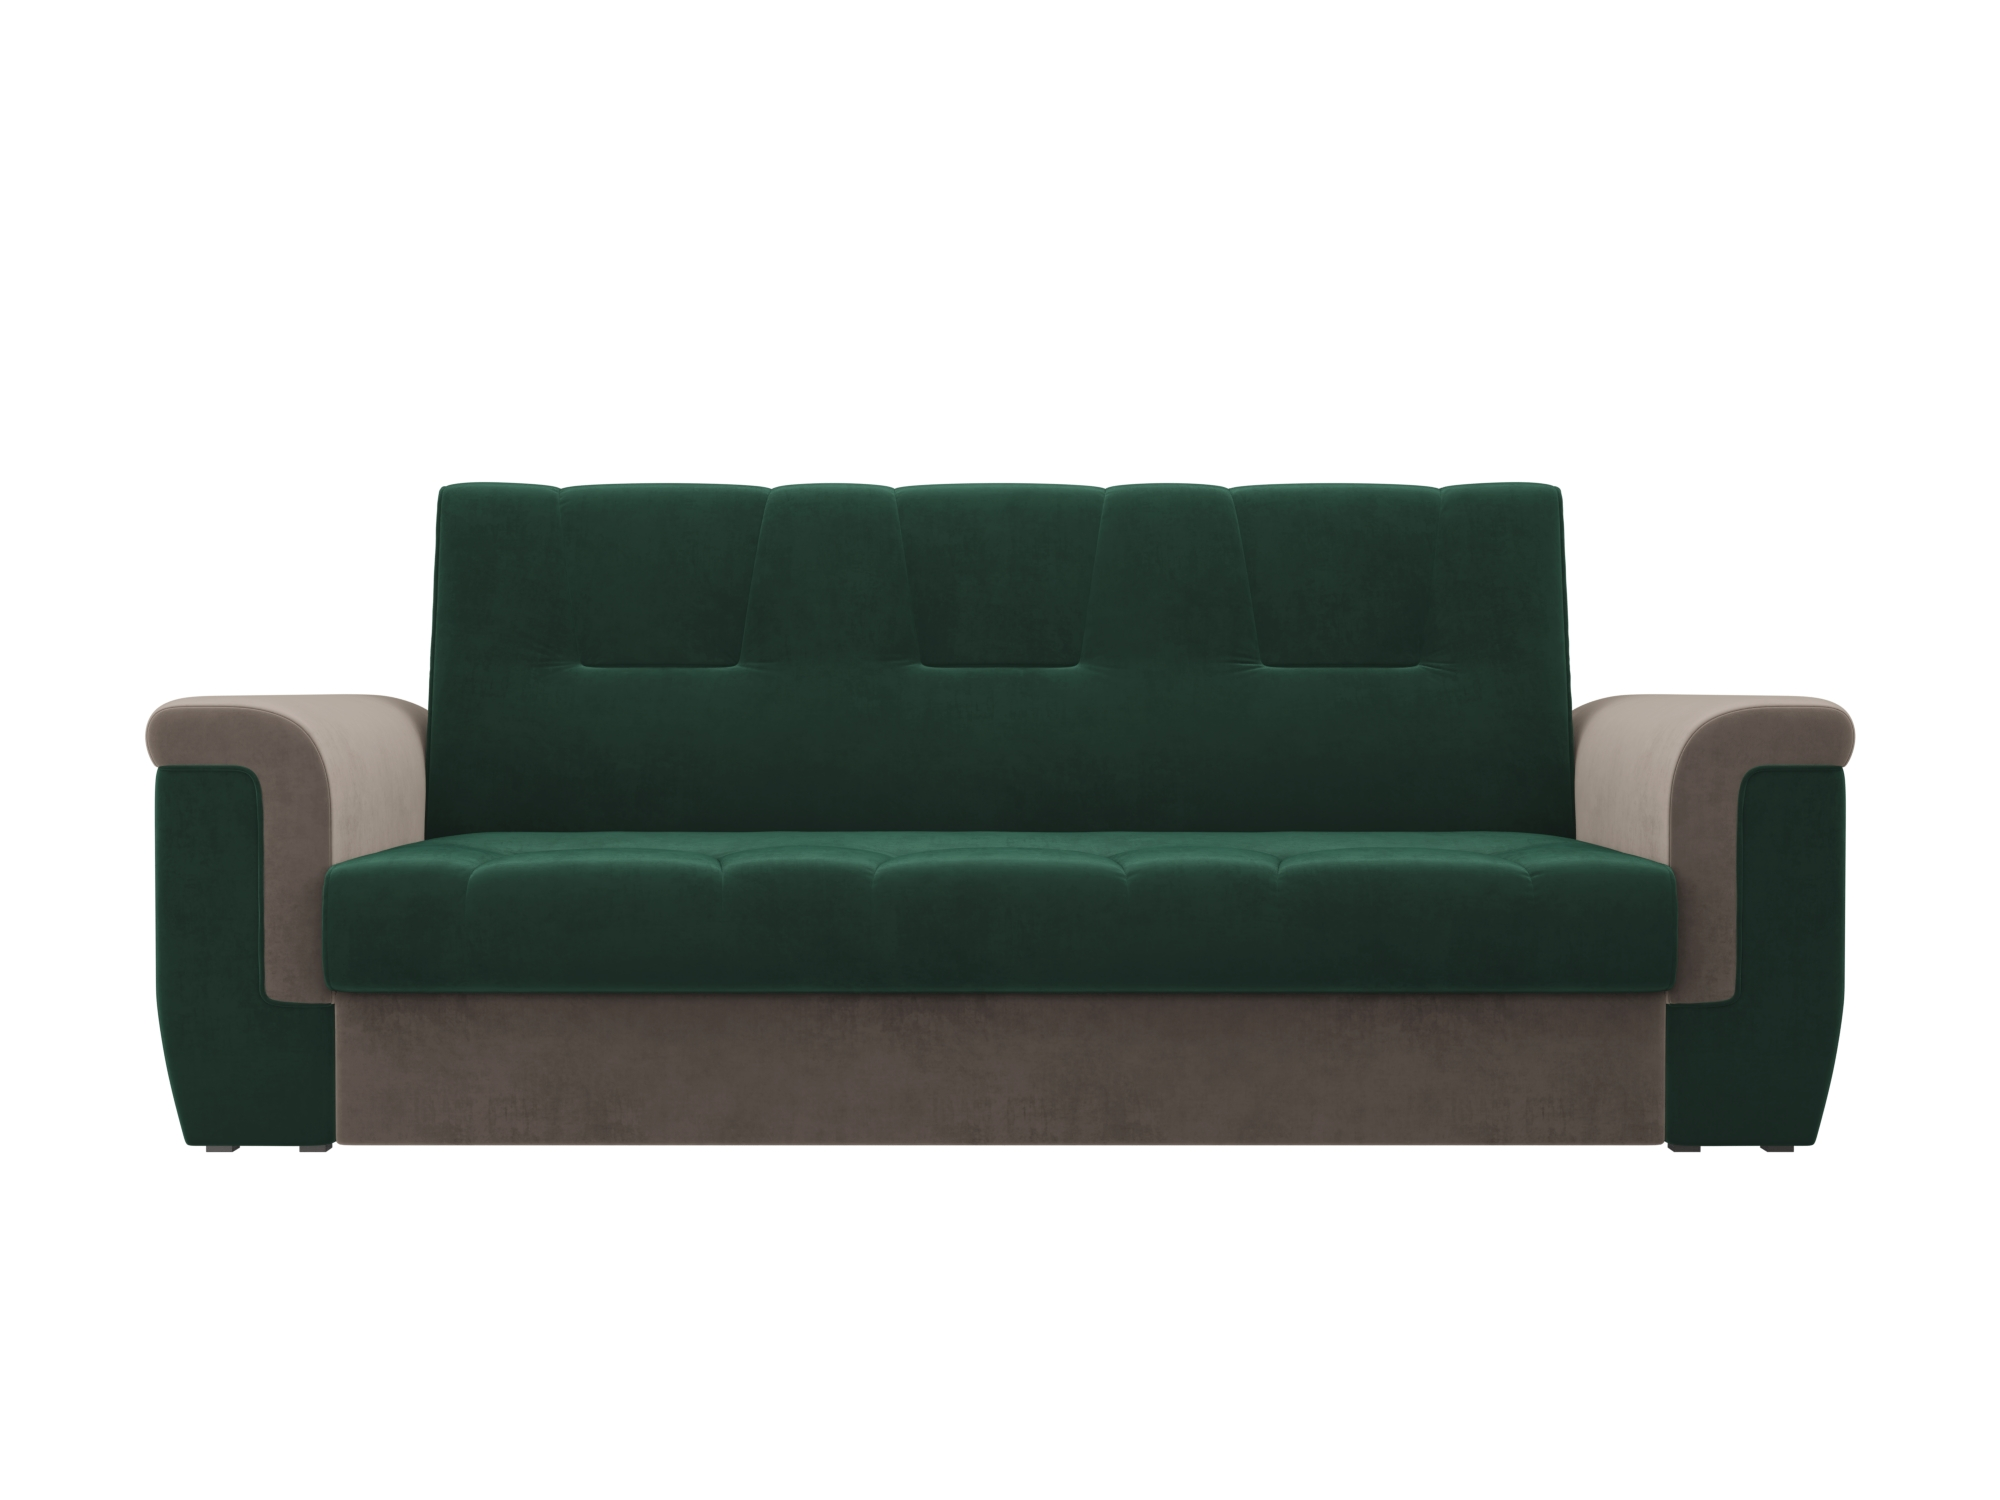 Диван Эллиот MebelVia Зеленый, Коричневый, Велюр, ЛДСП Зеленый, Коричневый